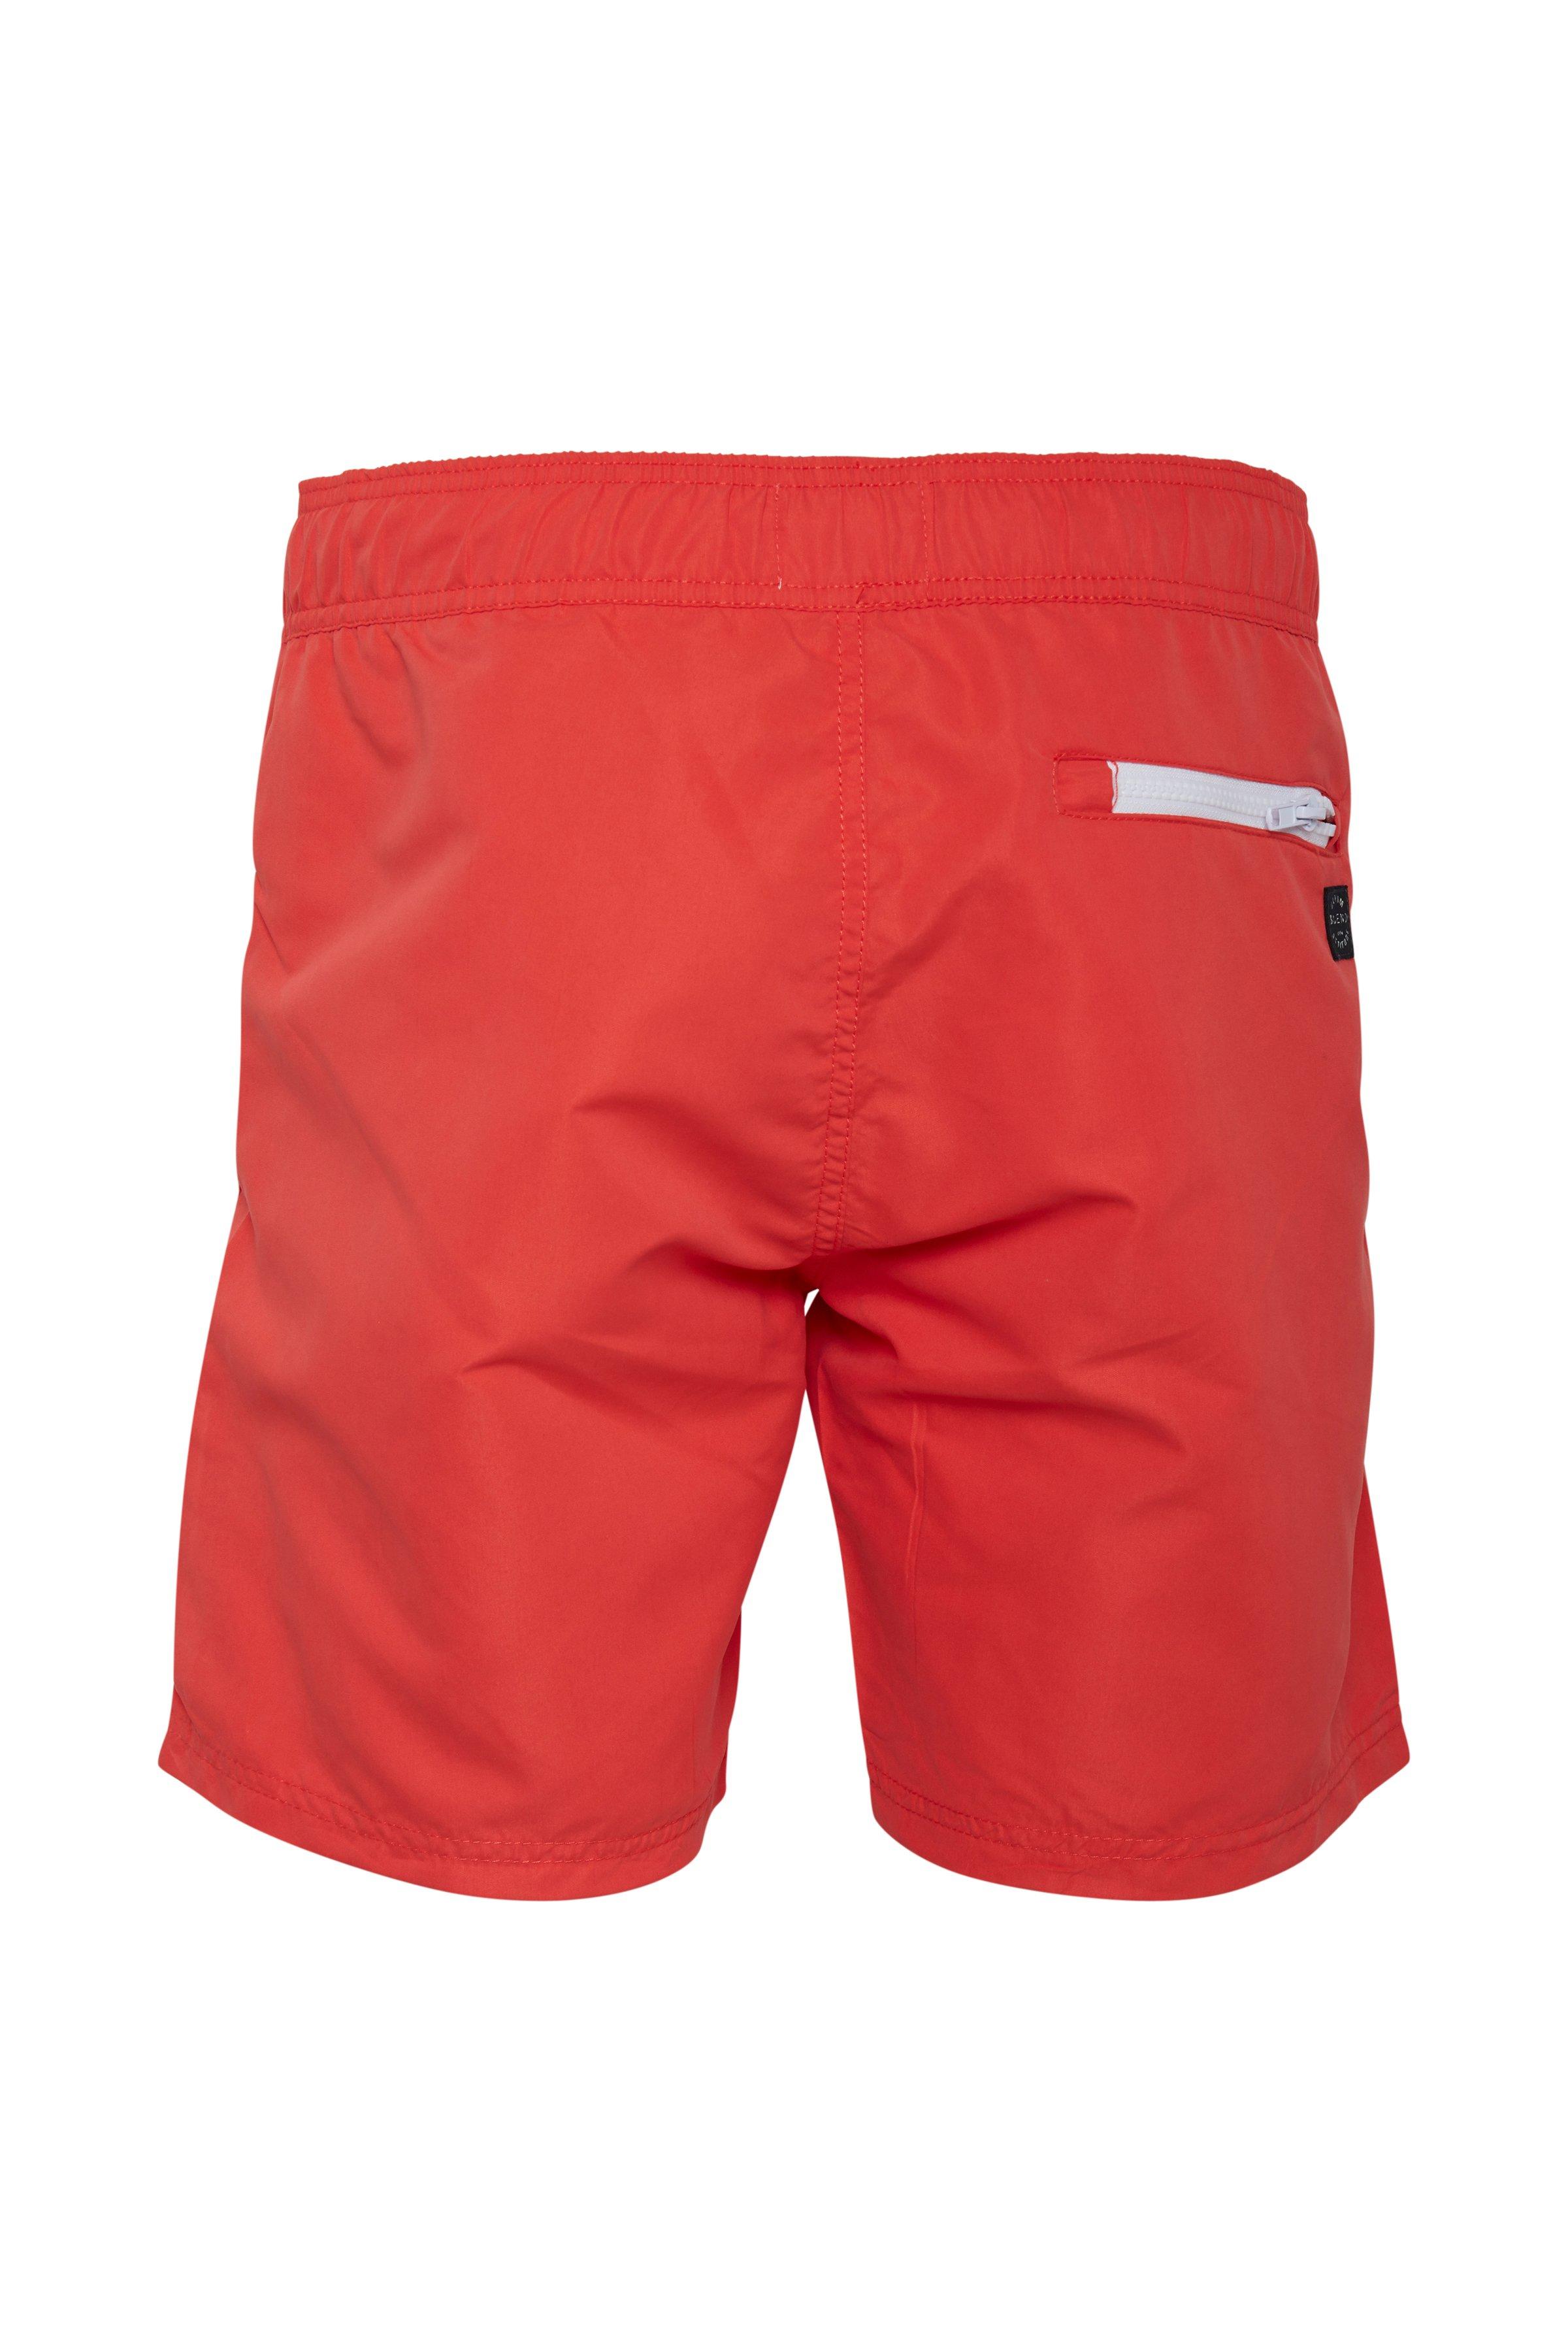 Cayenne Swimwear fra Blend He – Køb Cayenne Swimwear fra str. S-XXL her